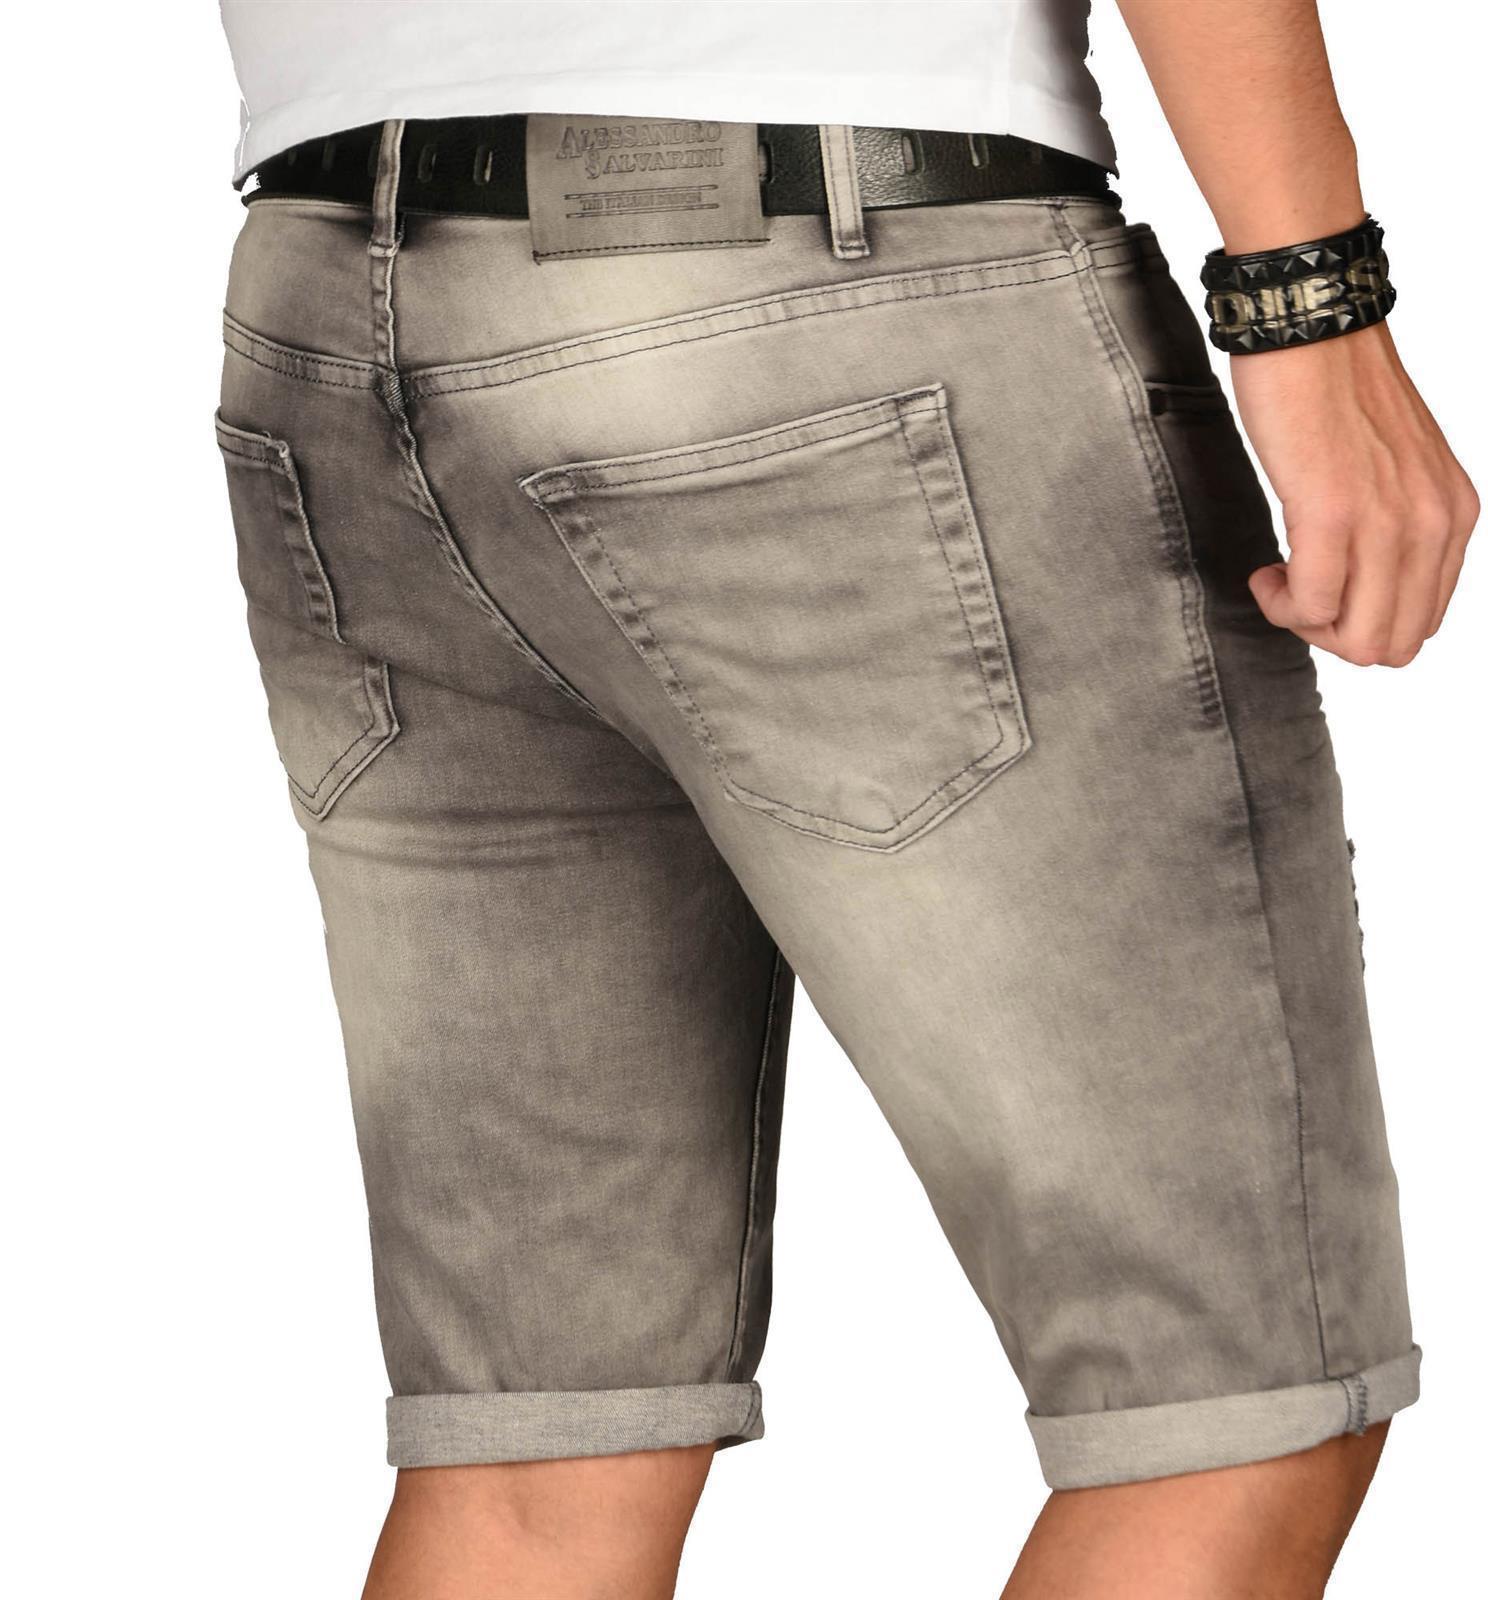 A-Salvarini-Herren-Designer-Jeans-Short-kurze-Hose-Slim-Sommer-Shorts-Washed Indexbild 44